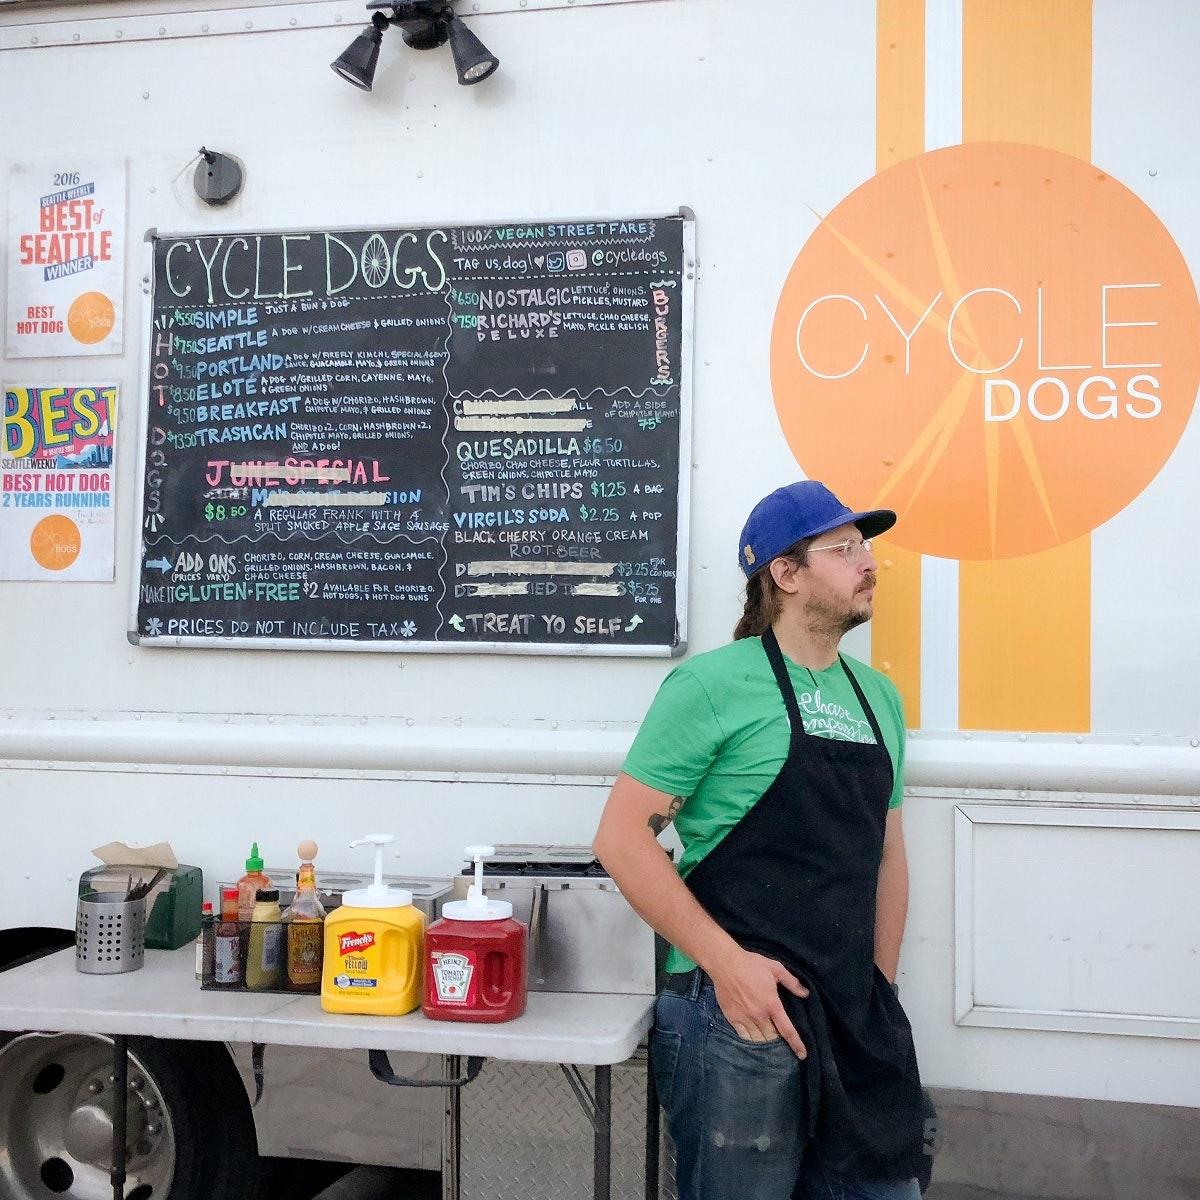 POLAROIDS: How Seattle's signature hot dog got its cream cheese